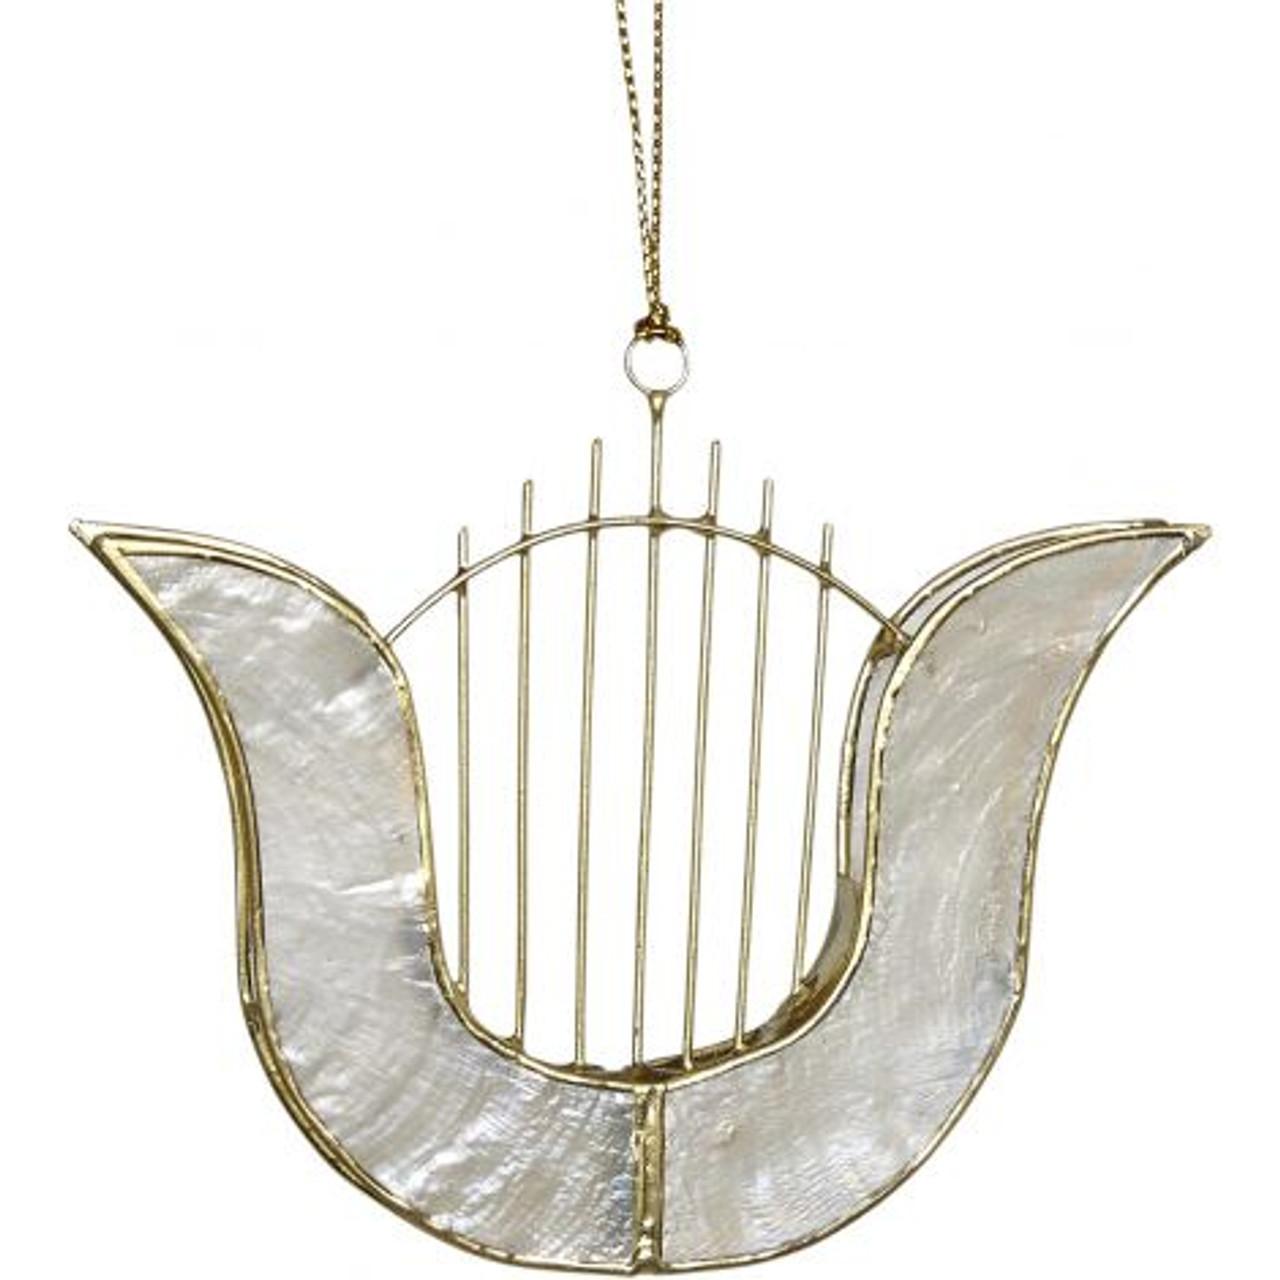 Capiz Music Ornaments - Set of 6 - Harp